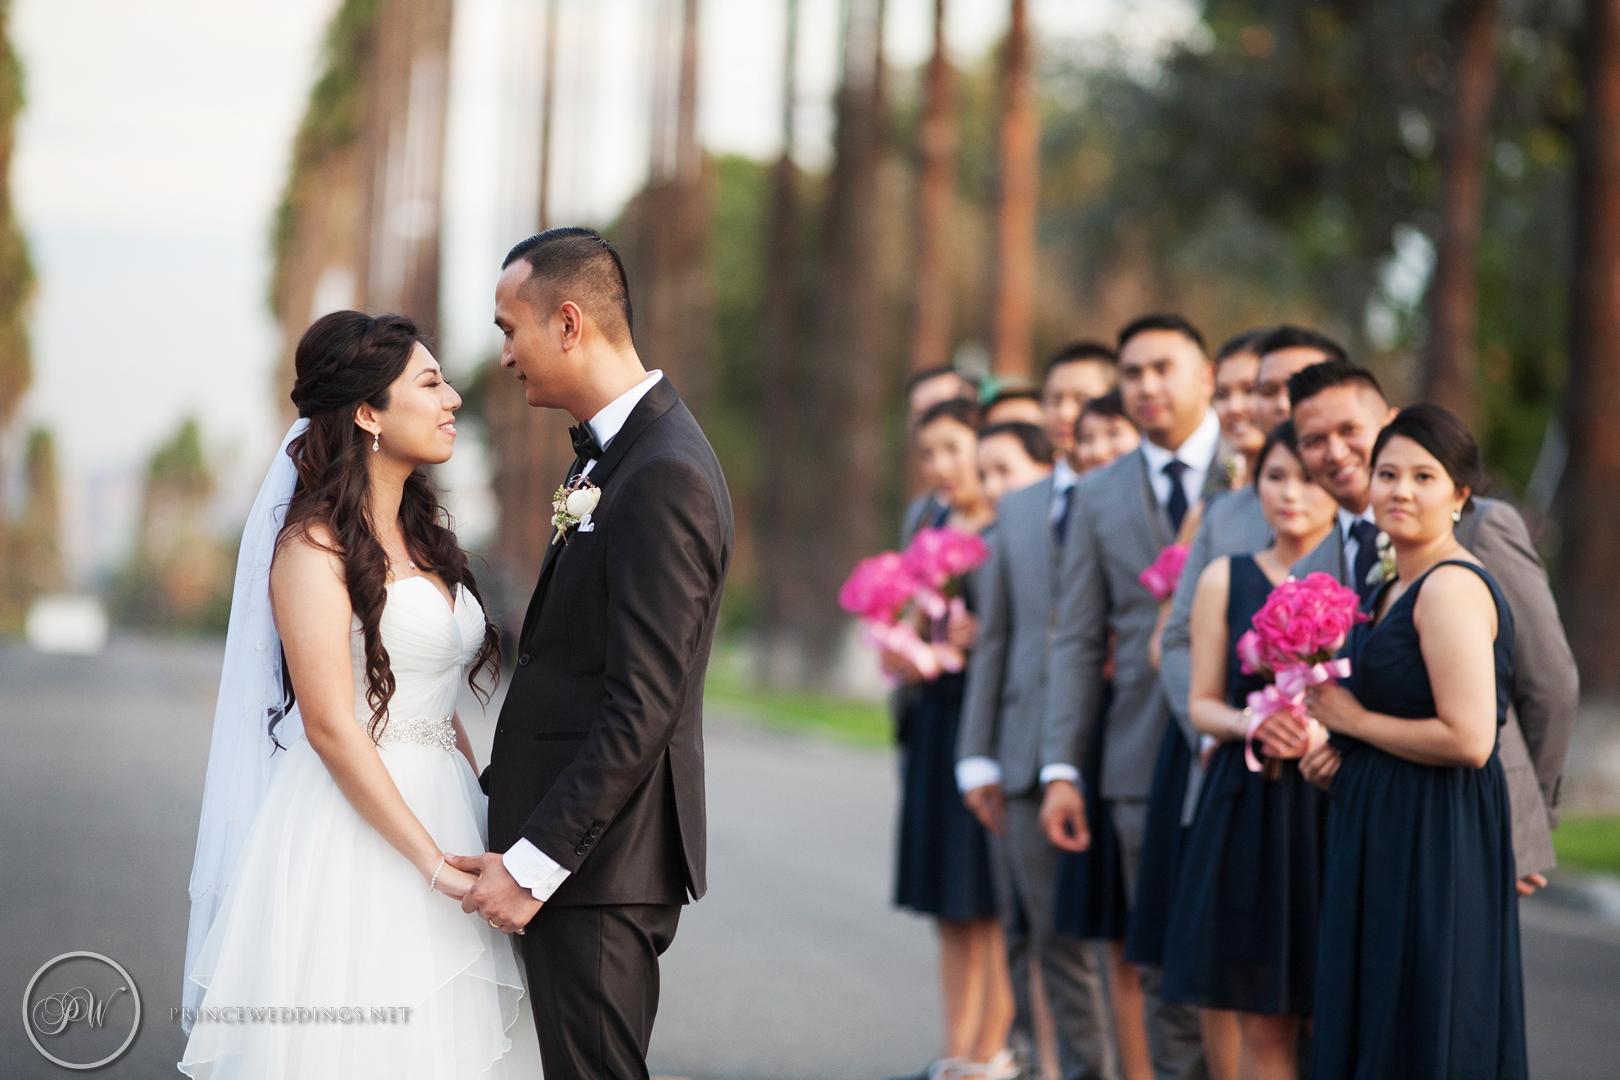 Castaway_Burbank_Wedding_Photo_Christian_Autumn056.jpg